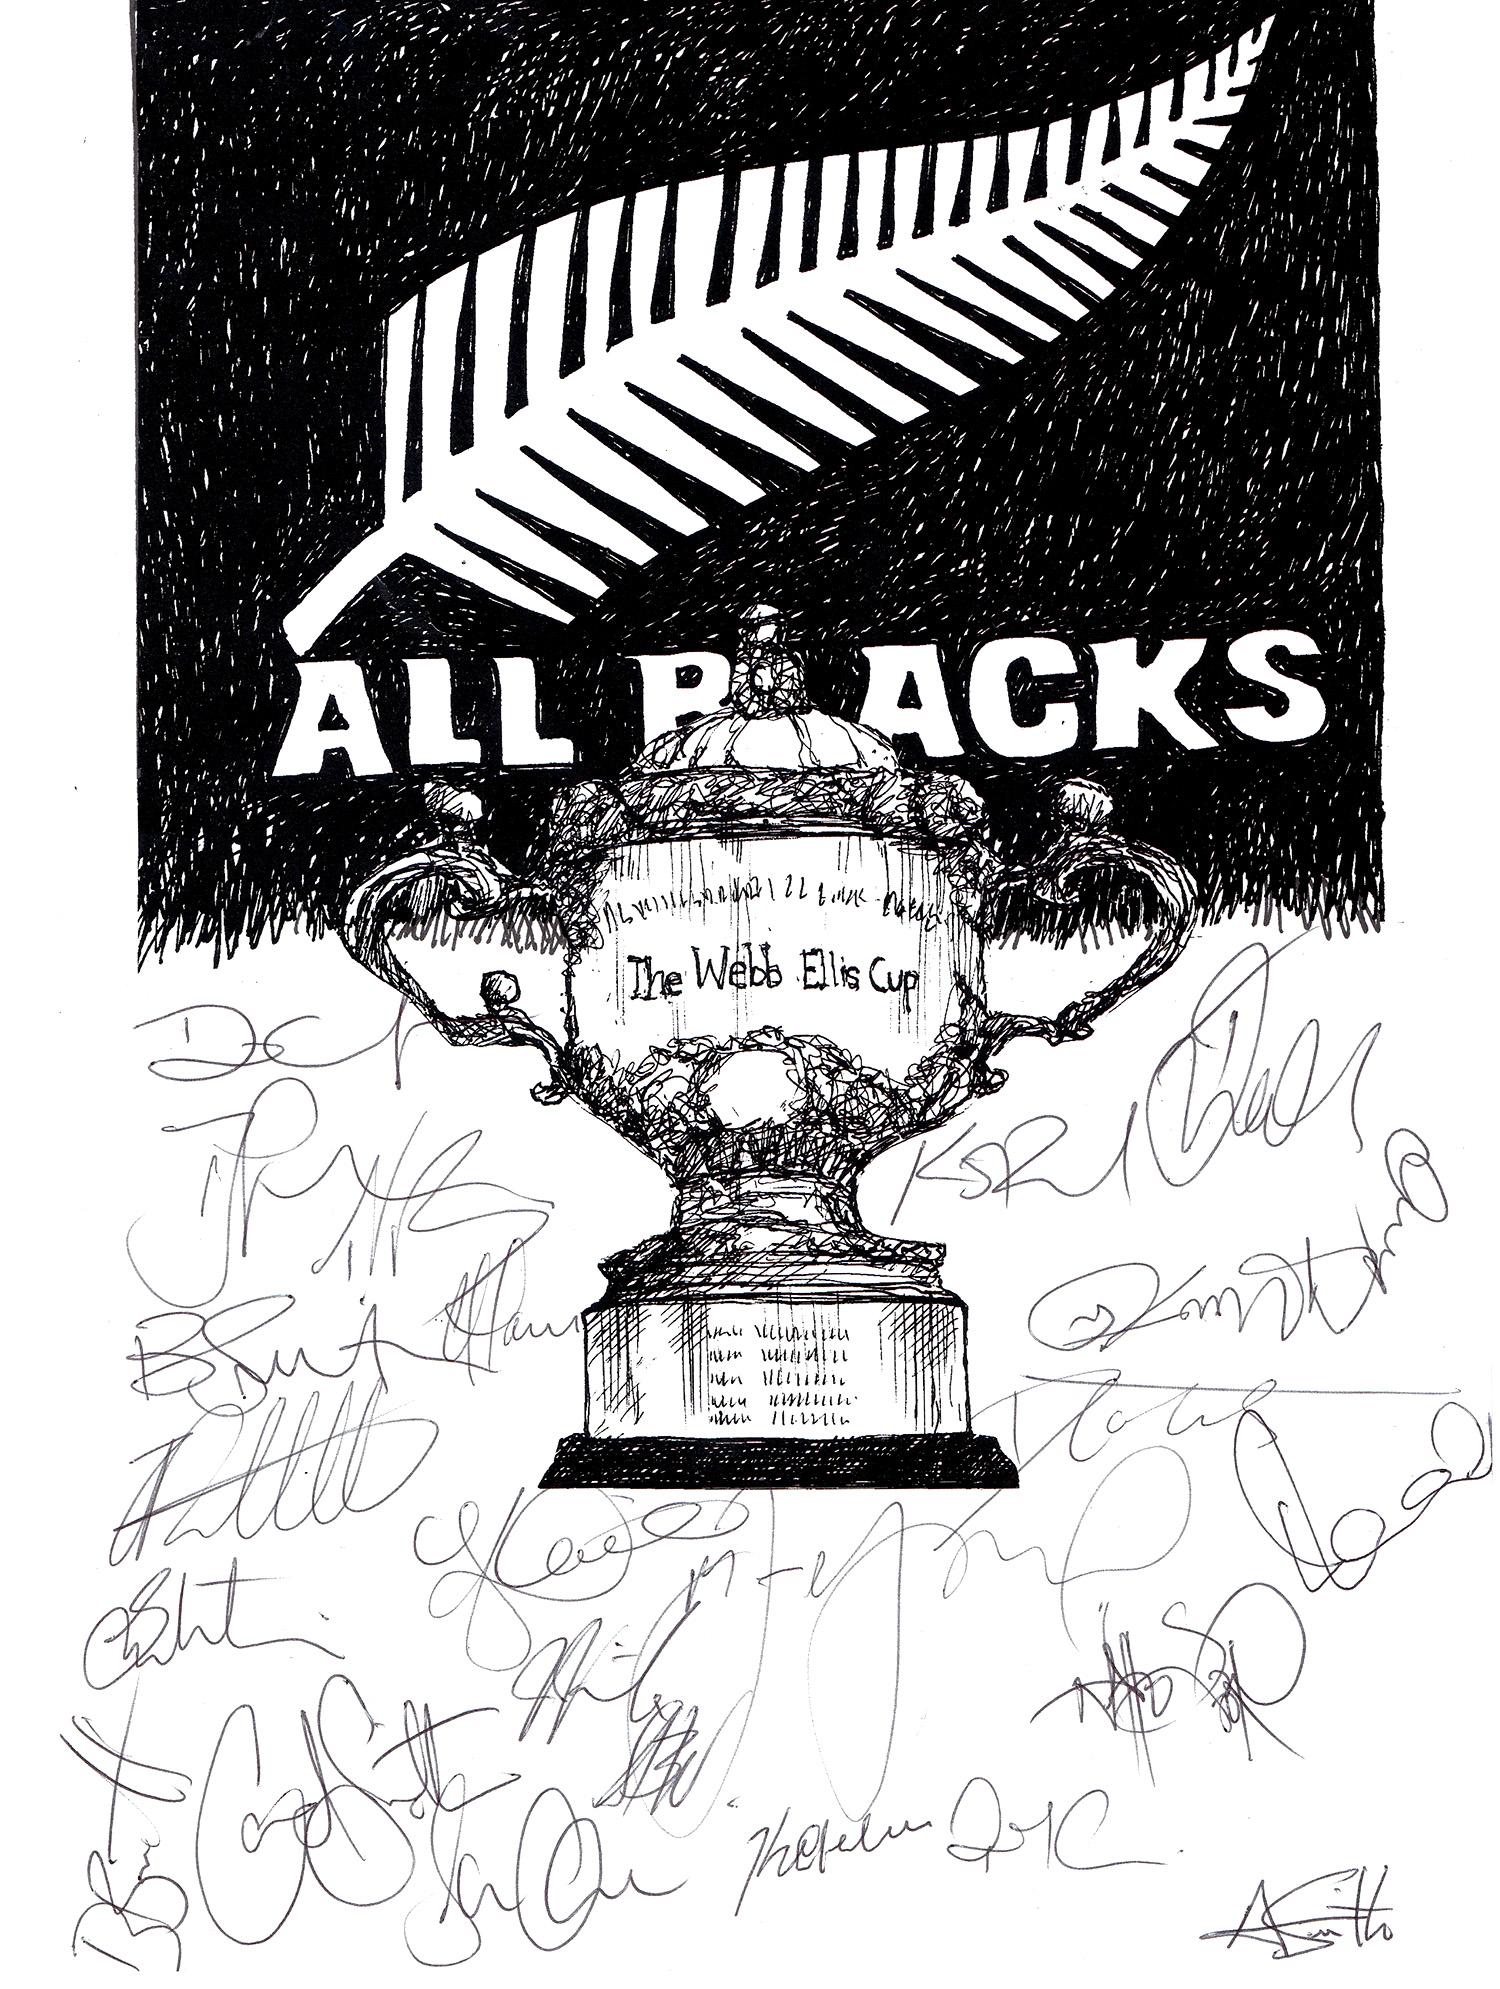 all blacks team sigs